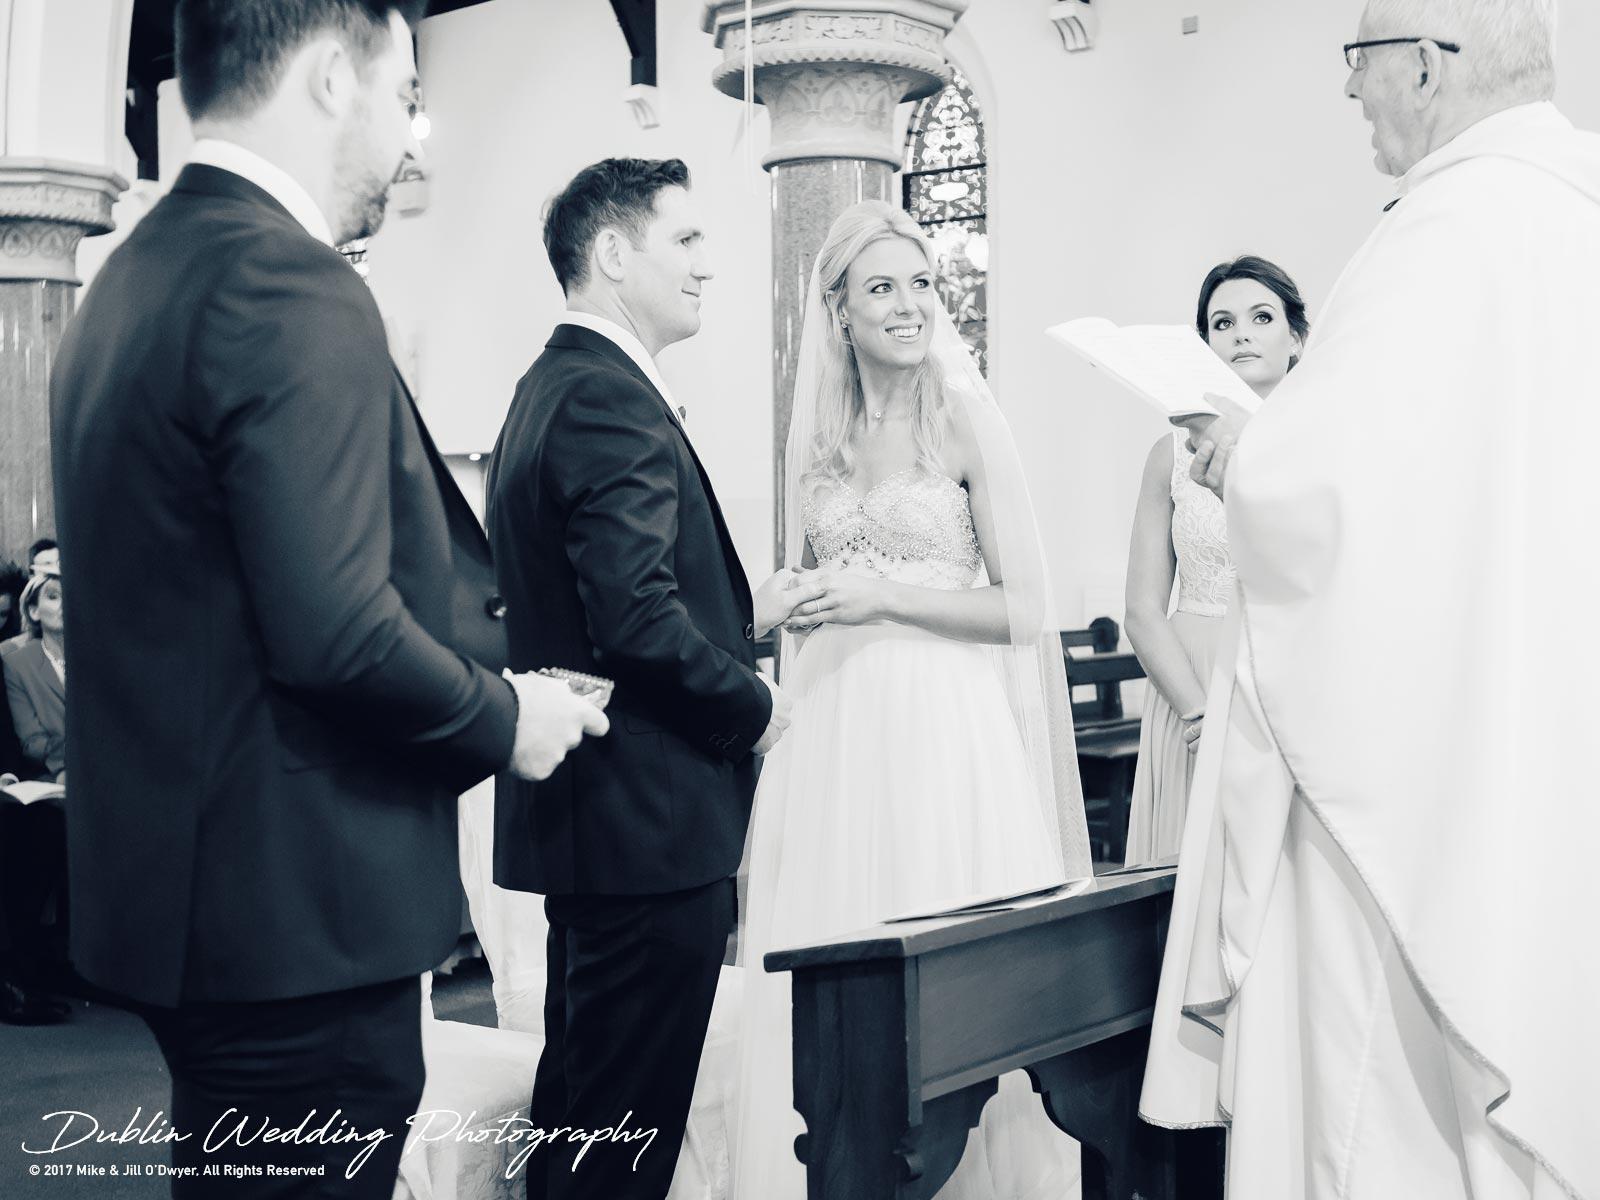 K Club, Kildare, Wedding Photographer, Dublin, Bride and Groom smiling at priest